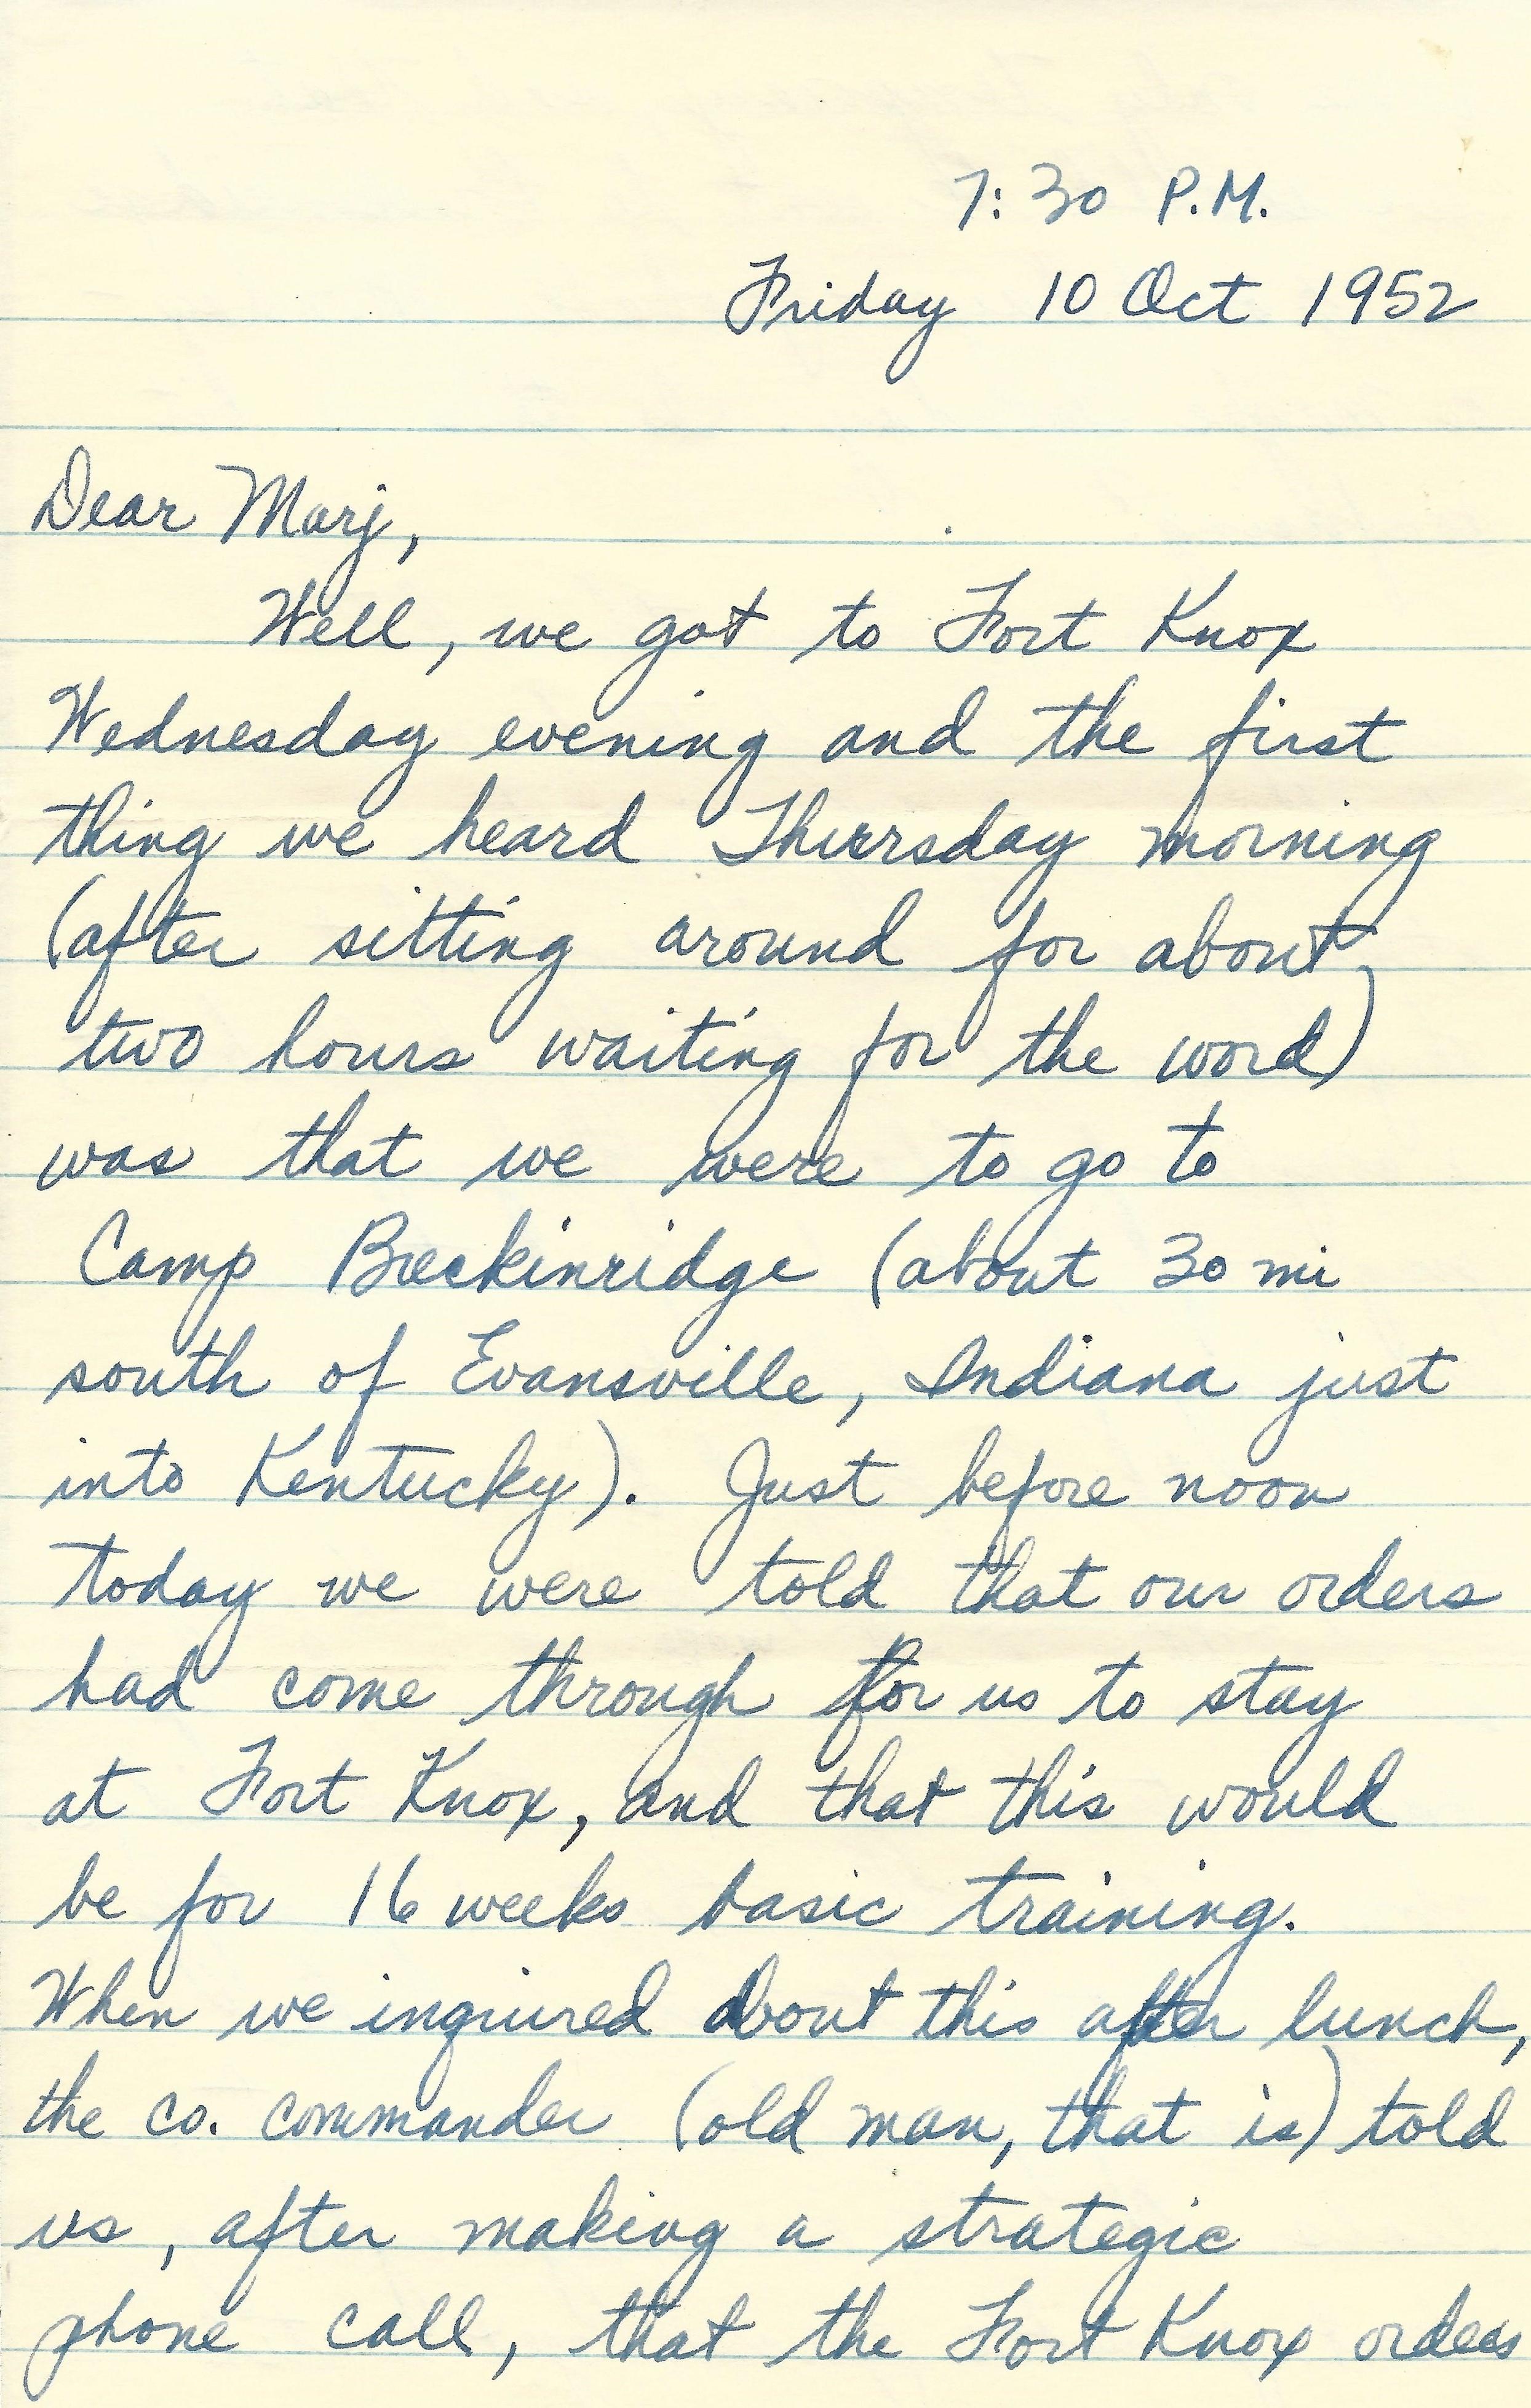 4. Oct. 10, 1952 (Opa)_Page_2.jpg